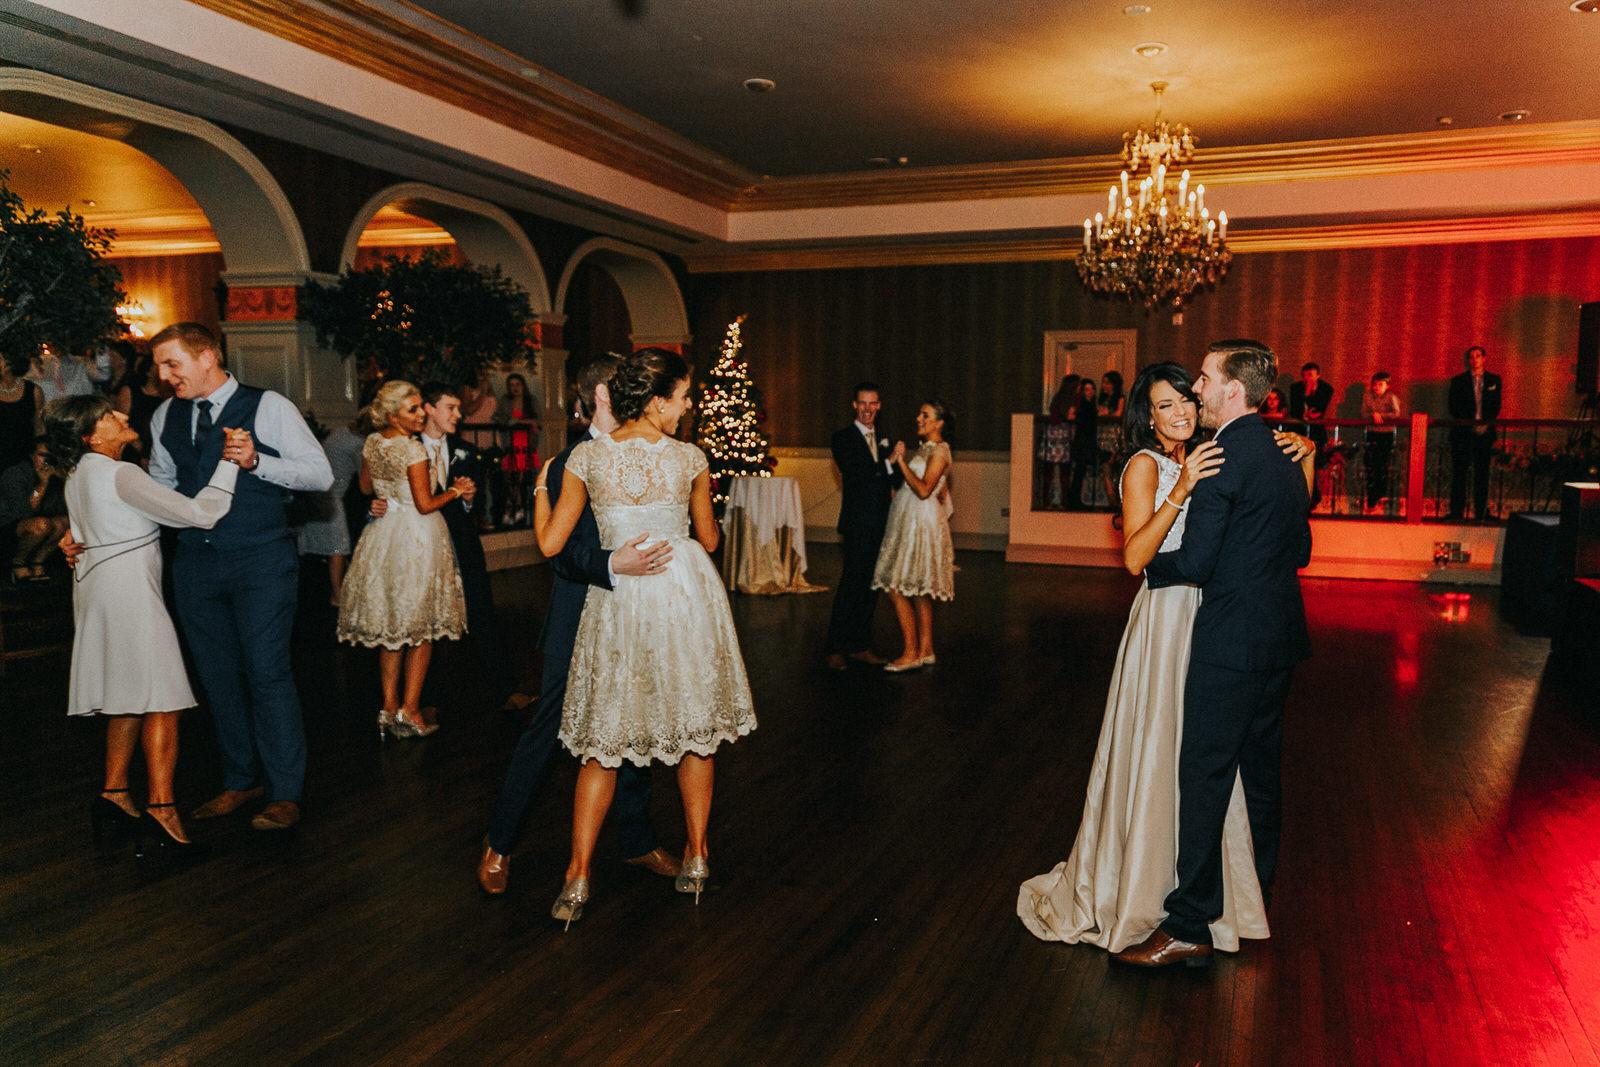 Roger_Kenny_wedding_photographer_522.jpg